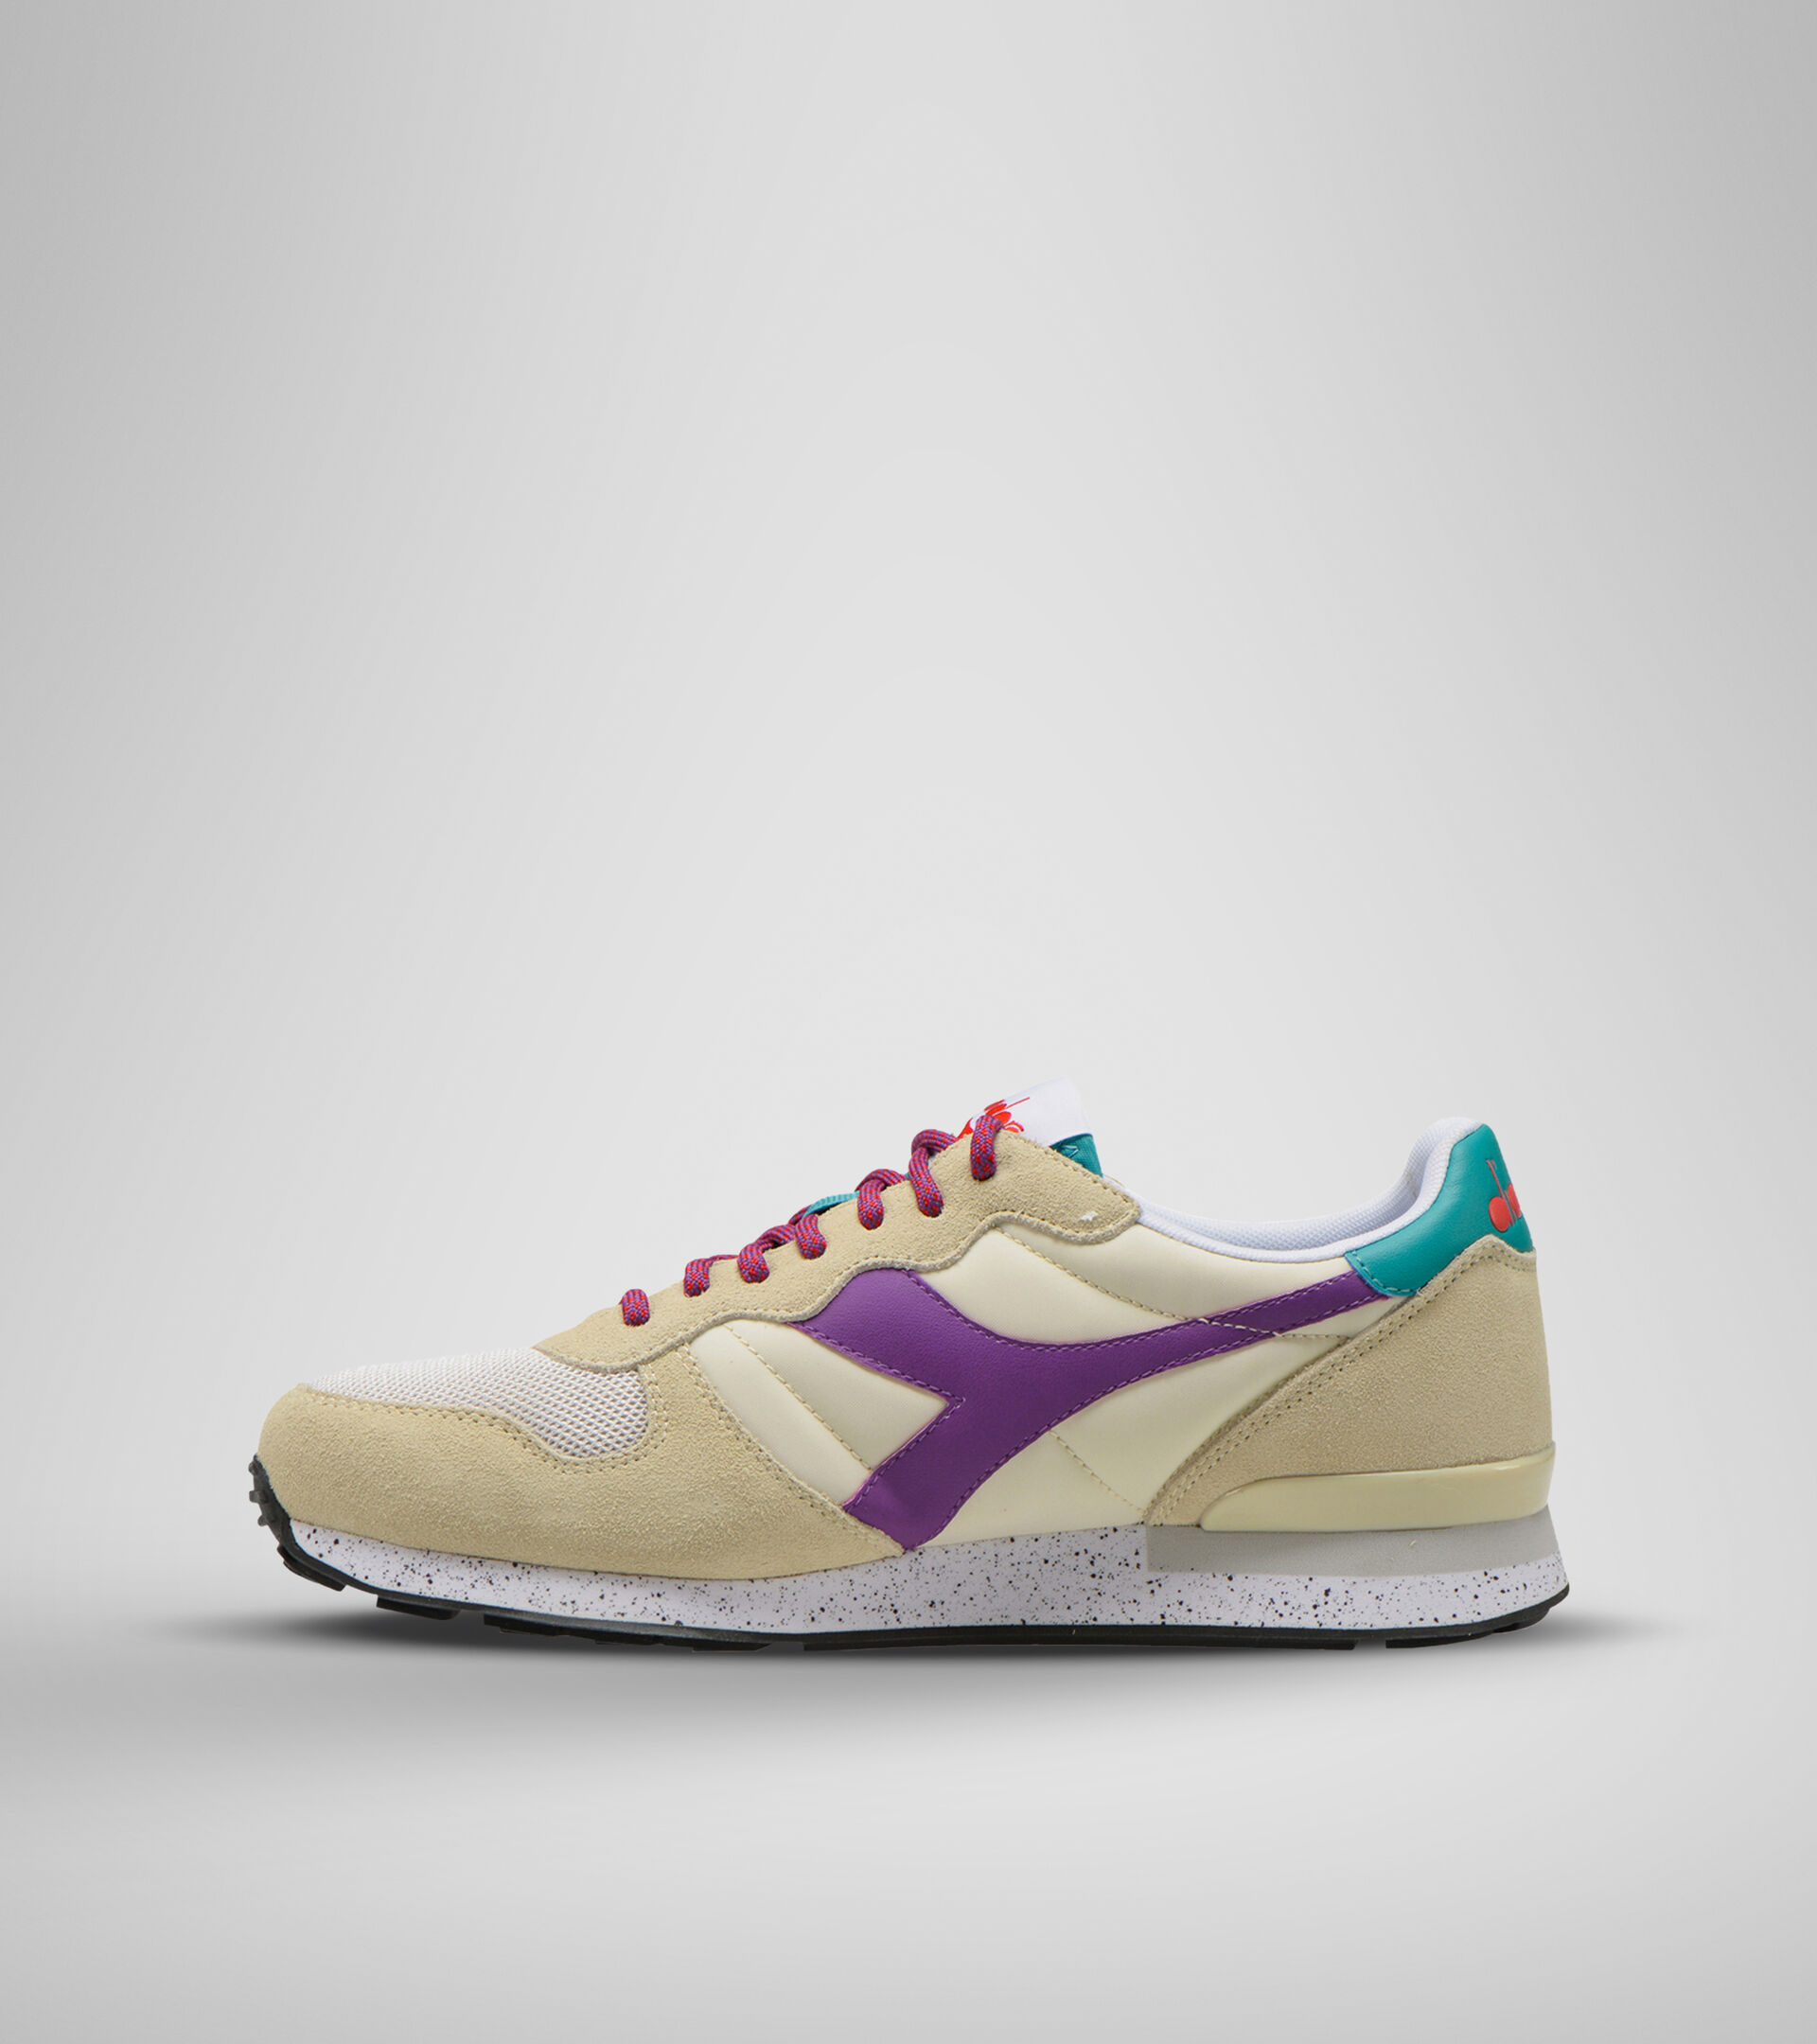 Footwear Sportswear UNISEX CAMARO OUTDOOR BEIGE OYSTER (25036) Diadora